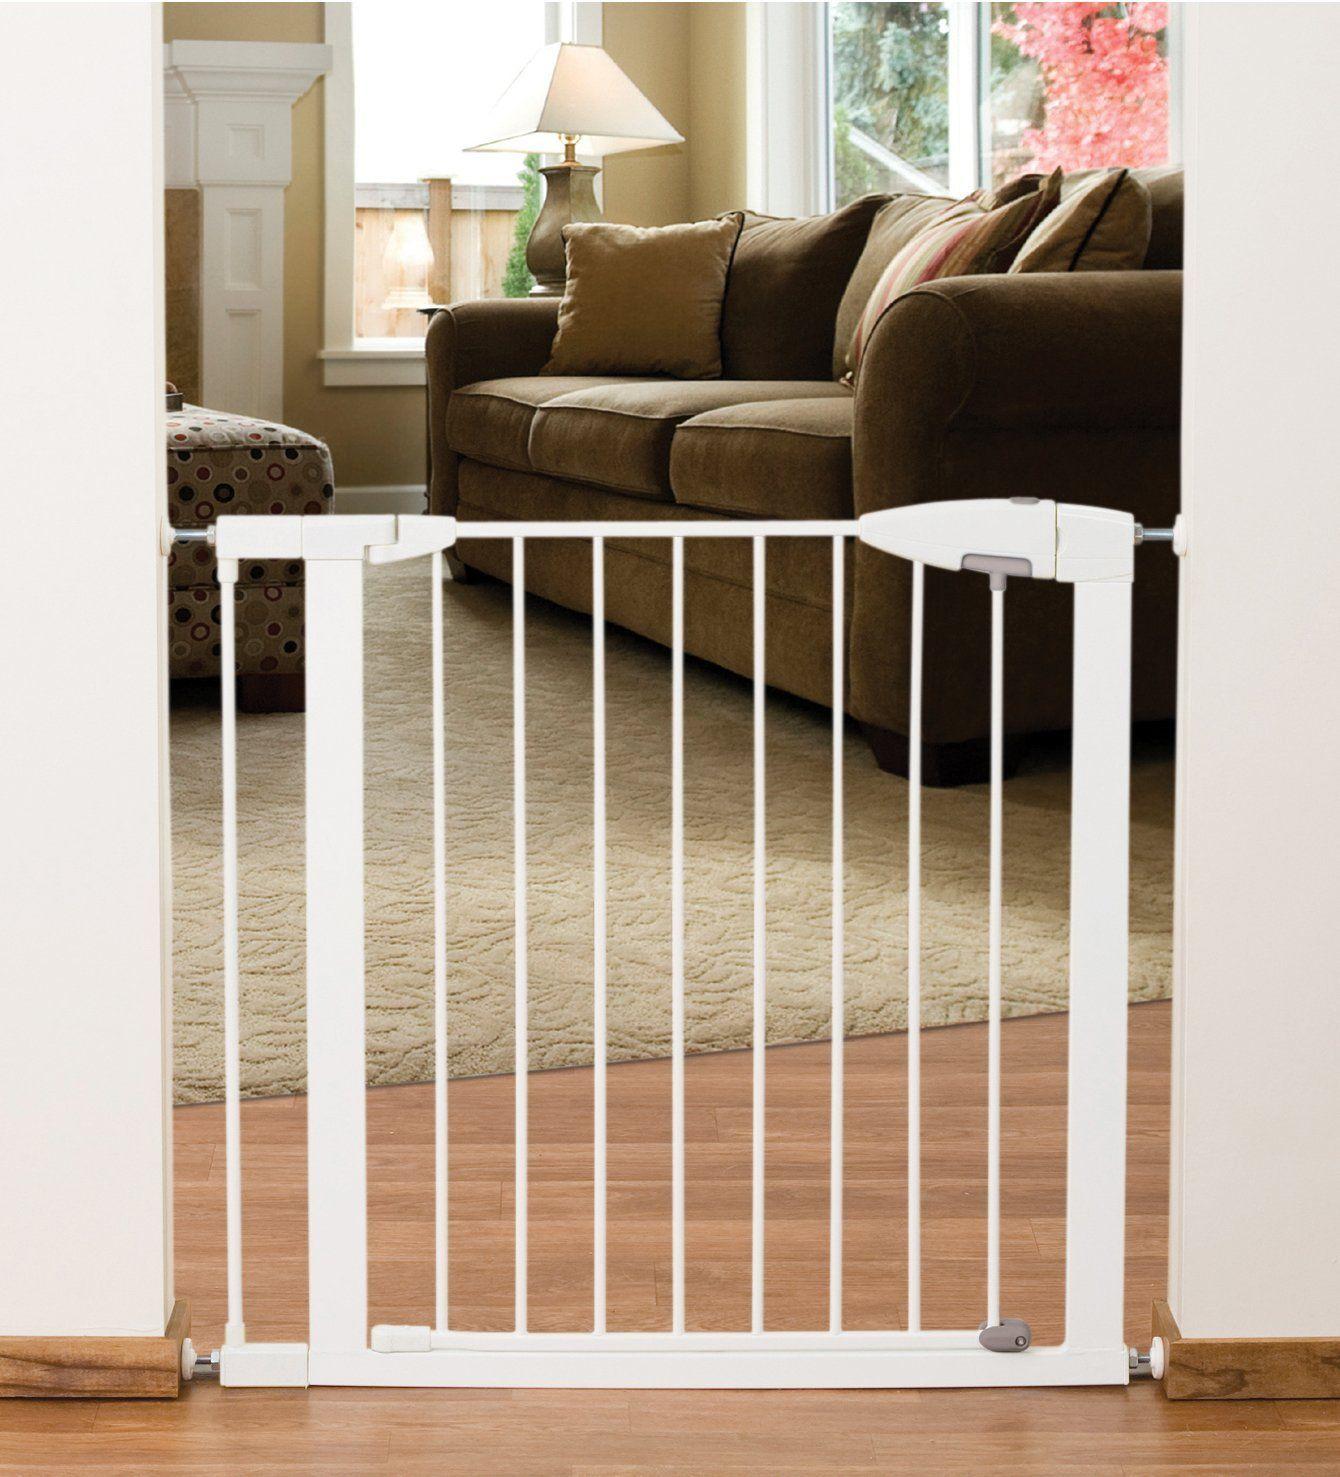 Munchkin EasyClose Metal Safety Gate, White Indoor